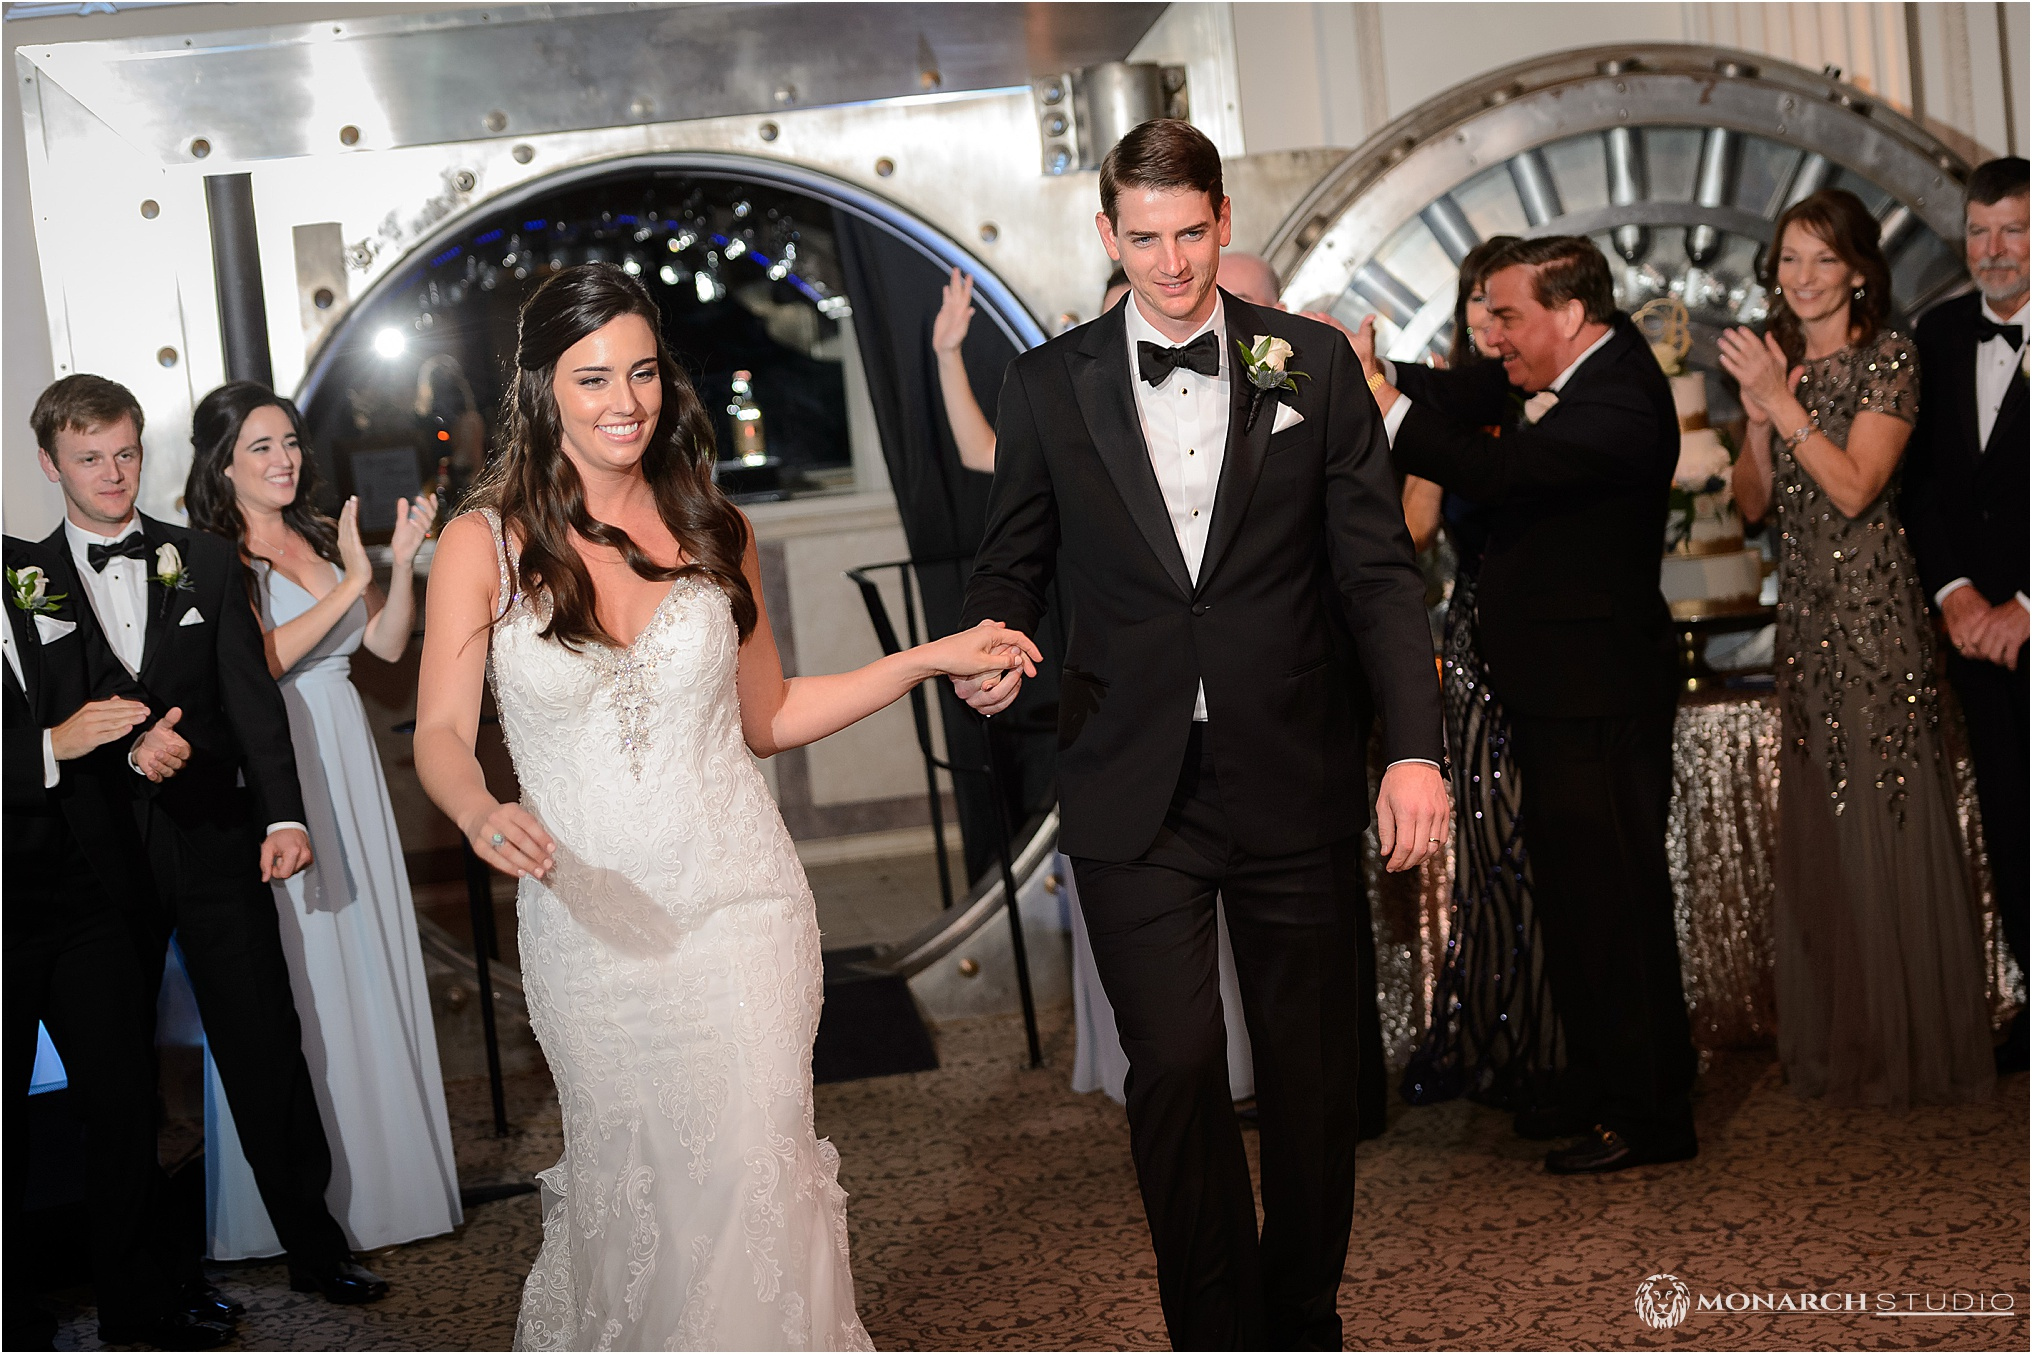 saint-augustine-wedding-photographer-treasury-065.jpg